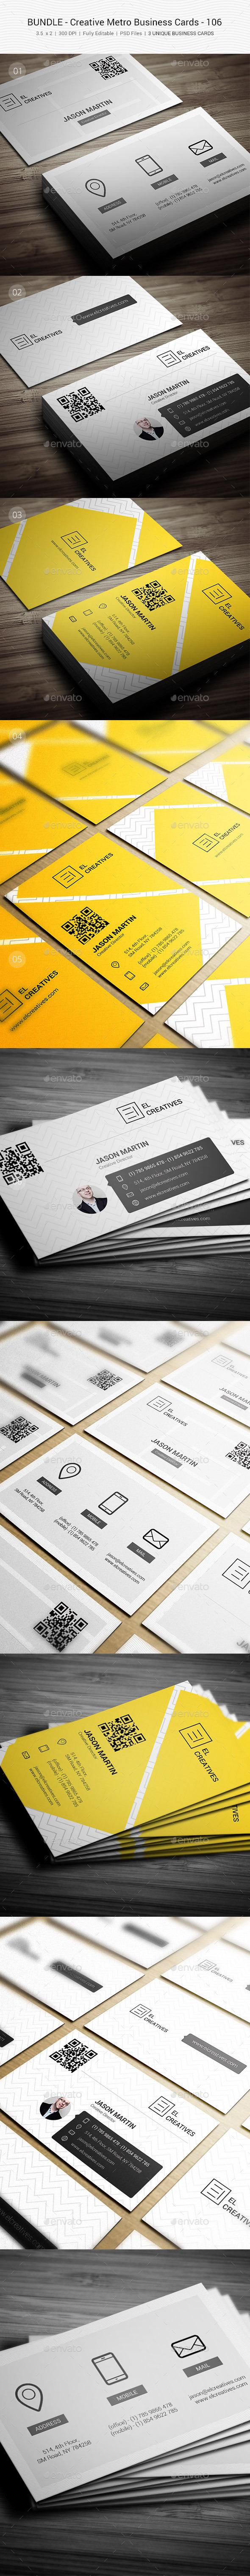 GraphicRiver Bundle Creative Metro Business Card 106 11320013